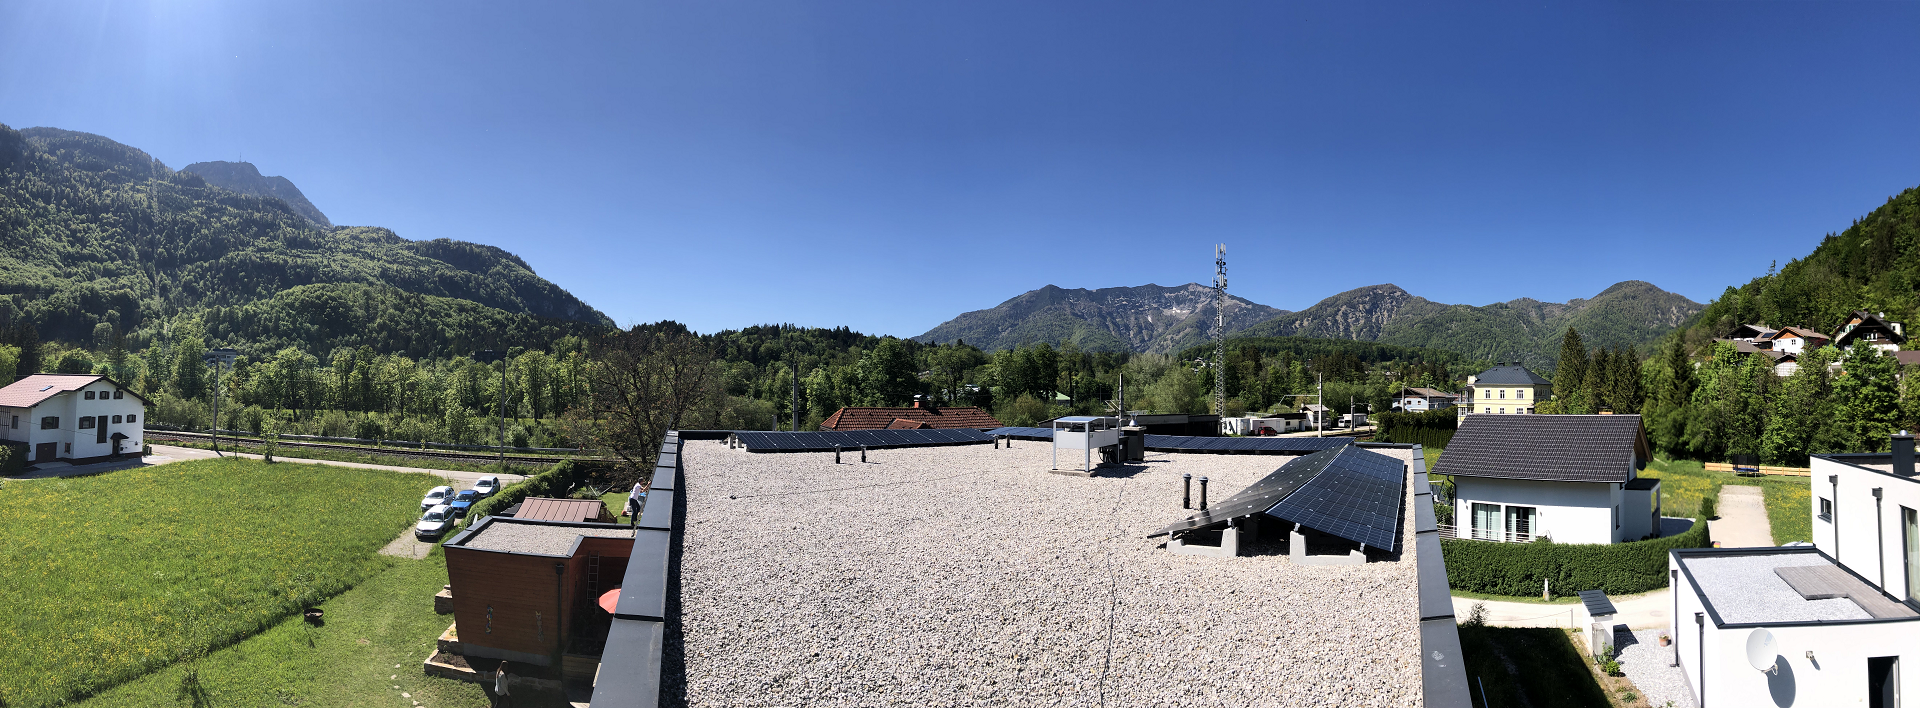 SOL-utions Photovoltaik Konzepte - Bad Ischl - Austria